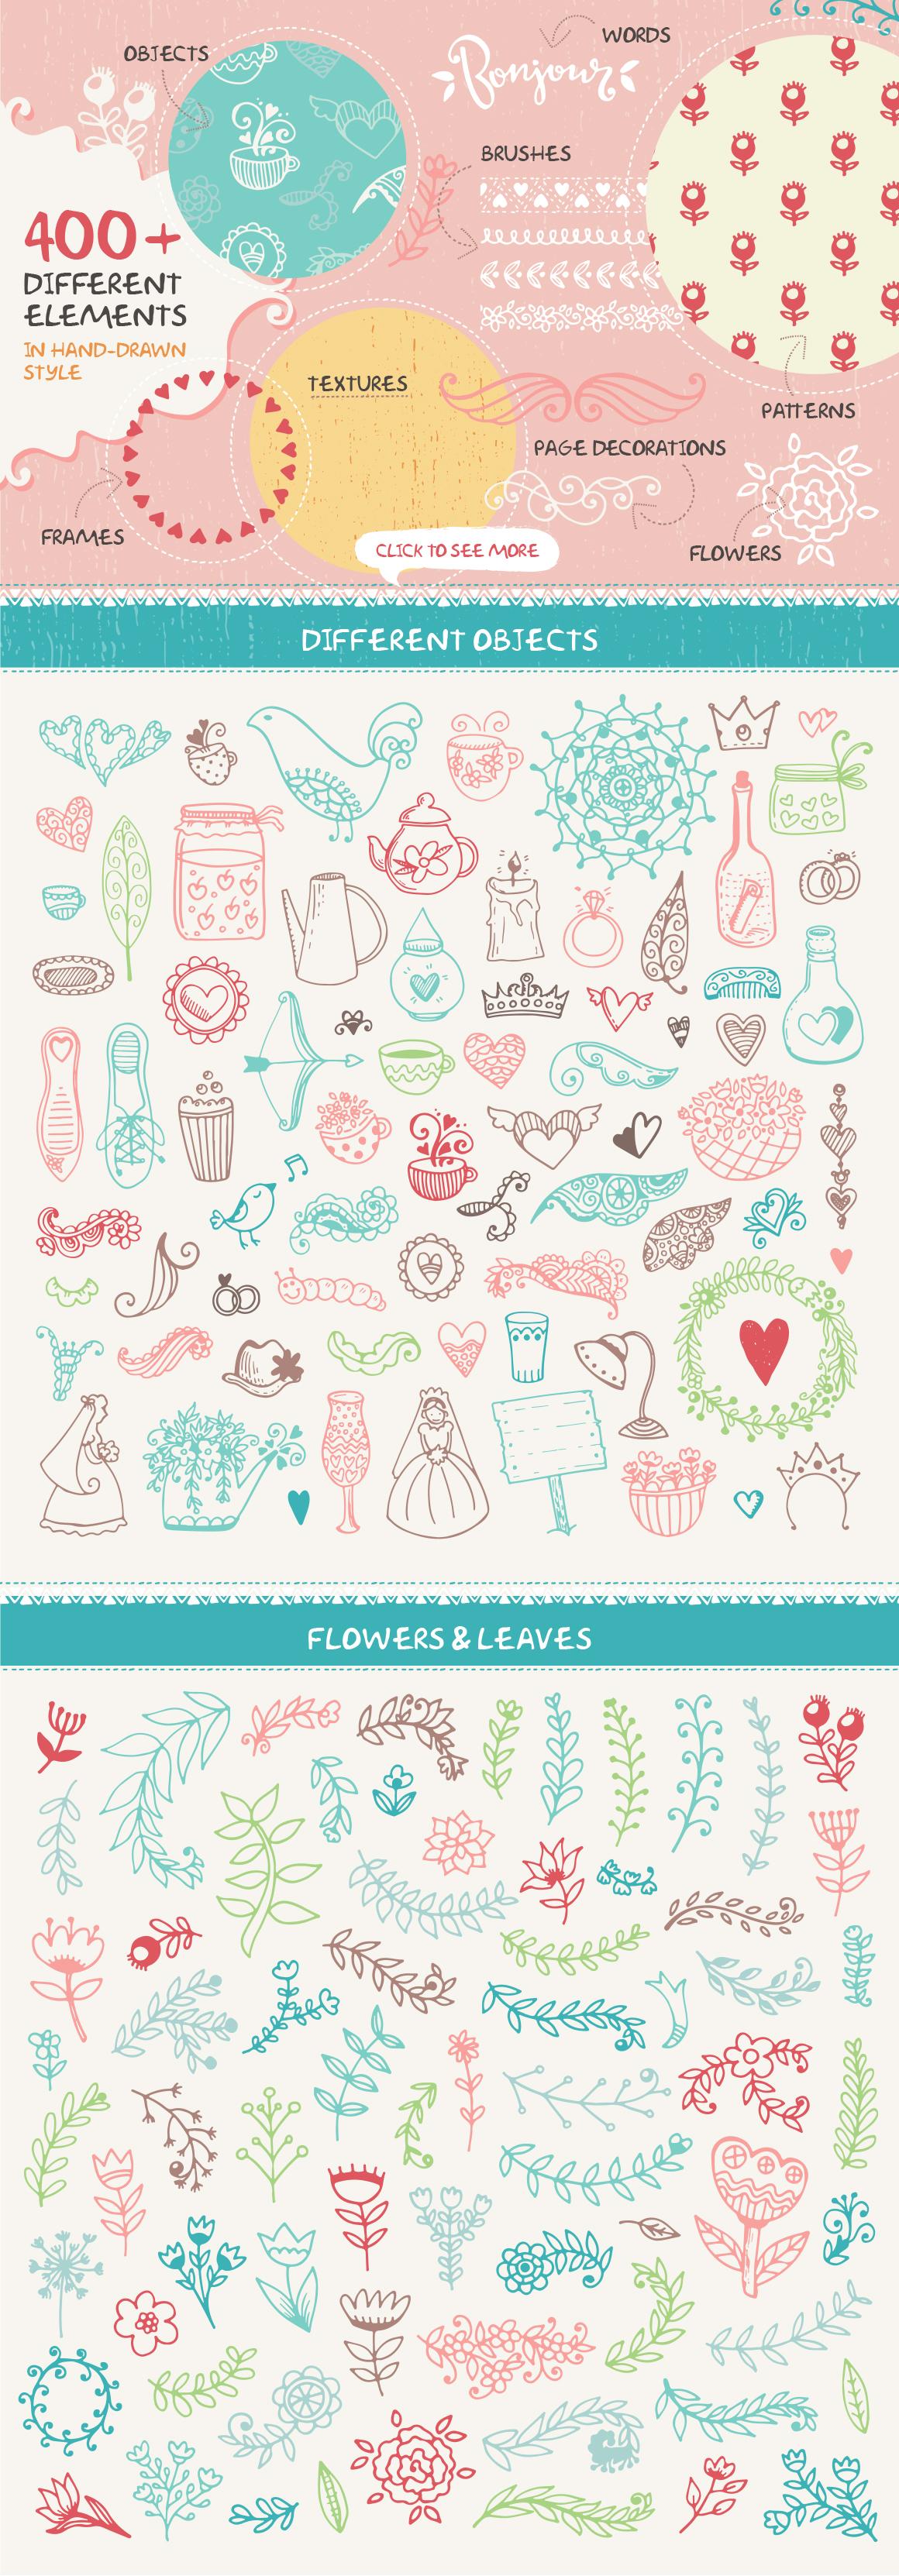 Romantic & Wedding Hand Drawn Set example image 2